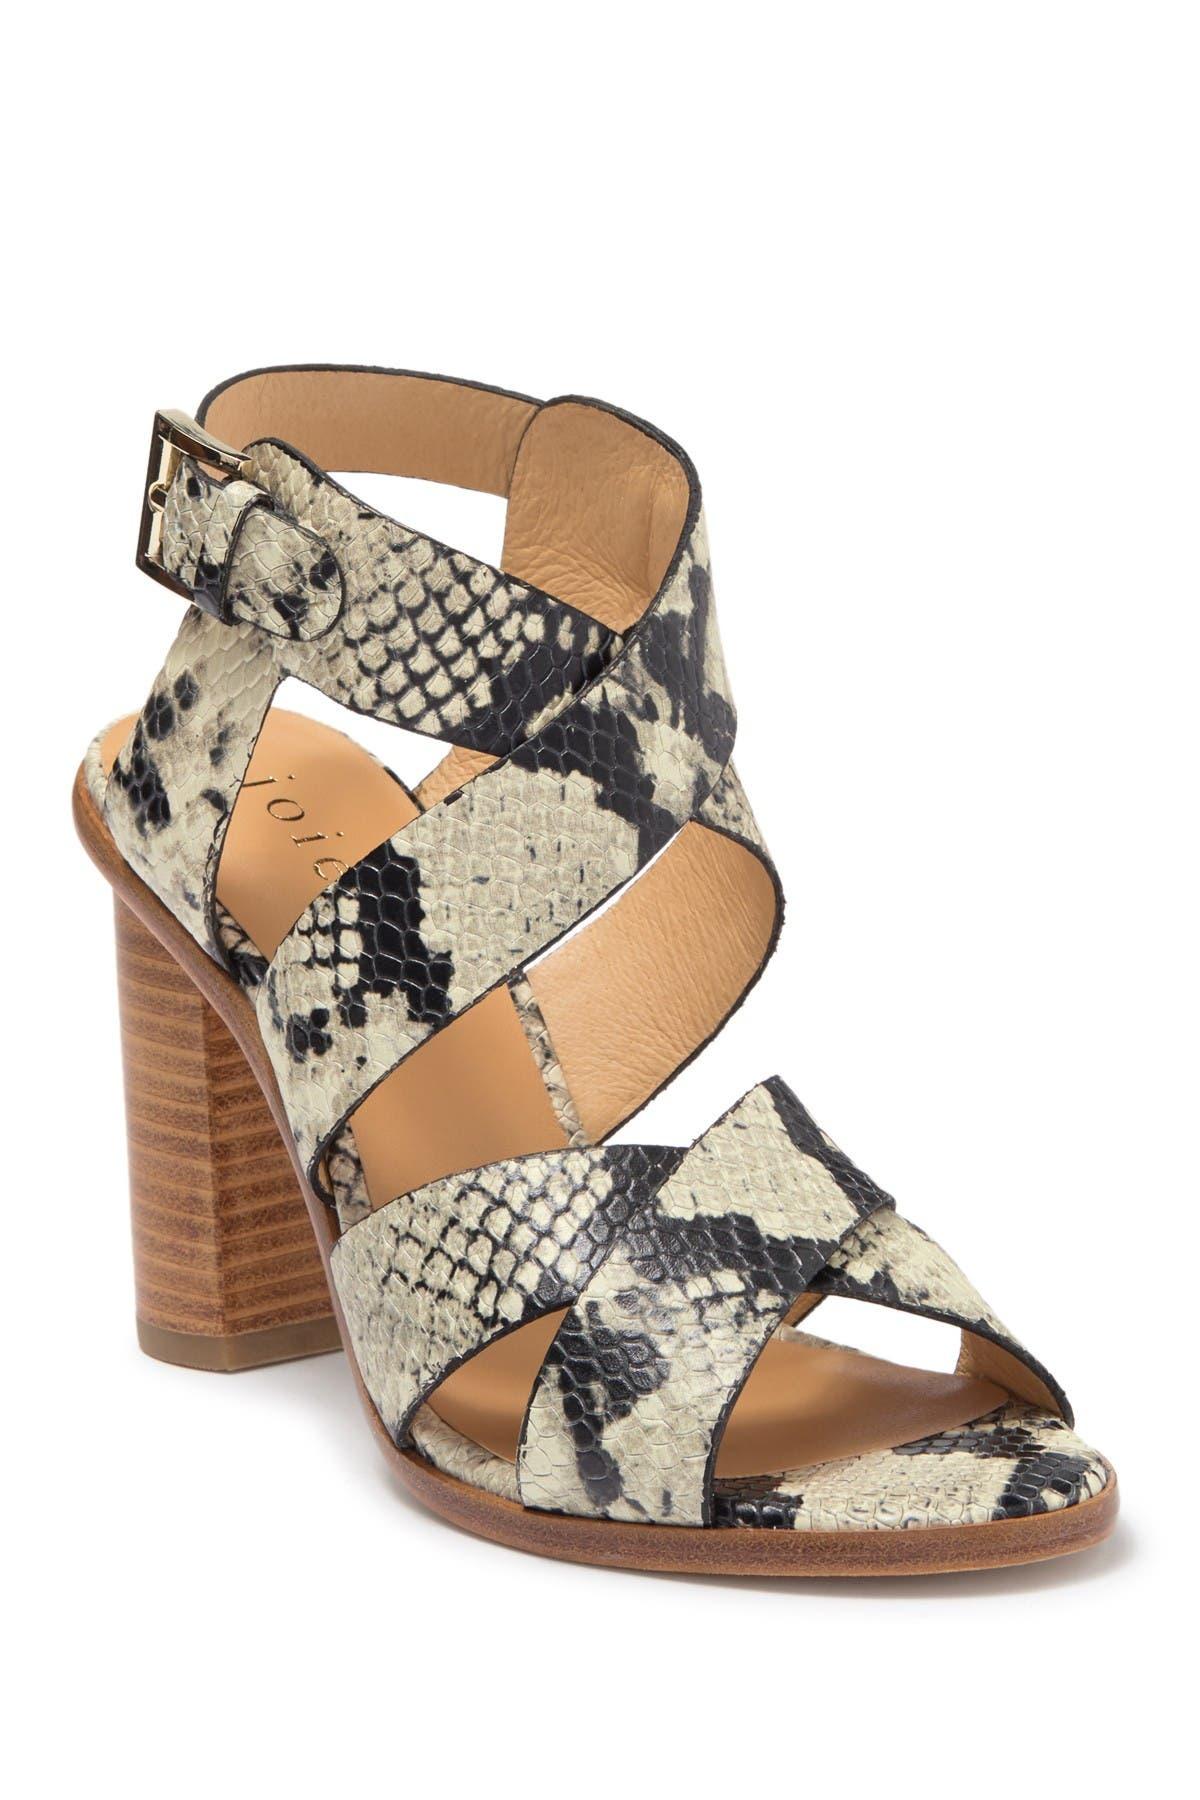 Image of Joie Avery Snake Embossed Leather Block Heel Sandal